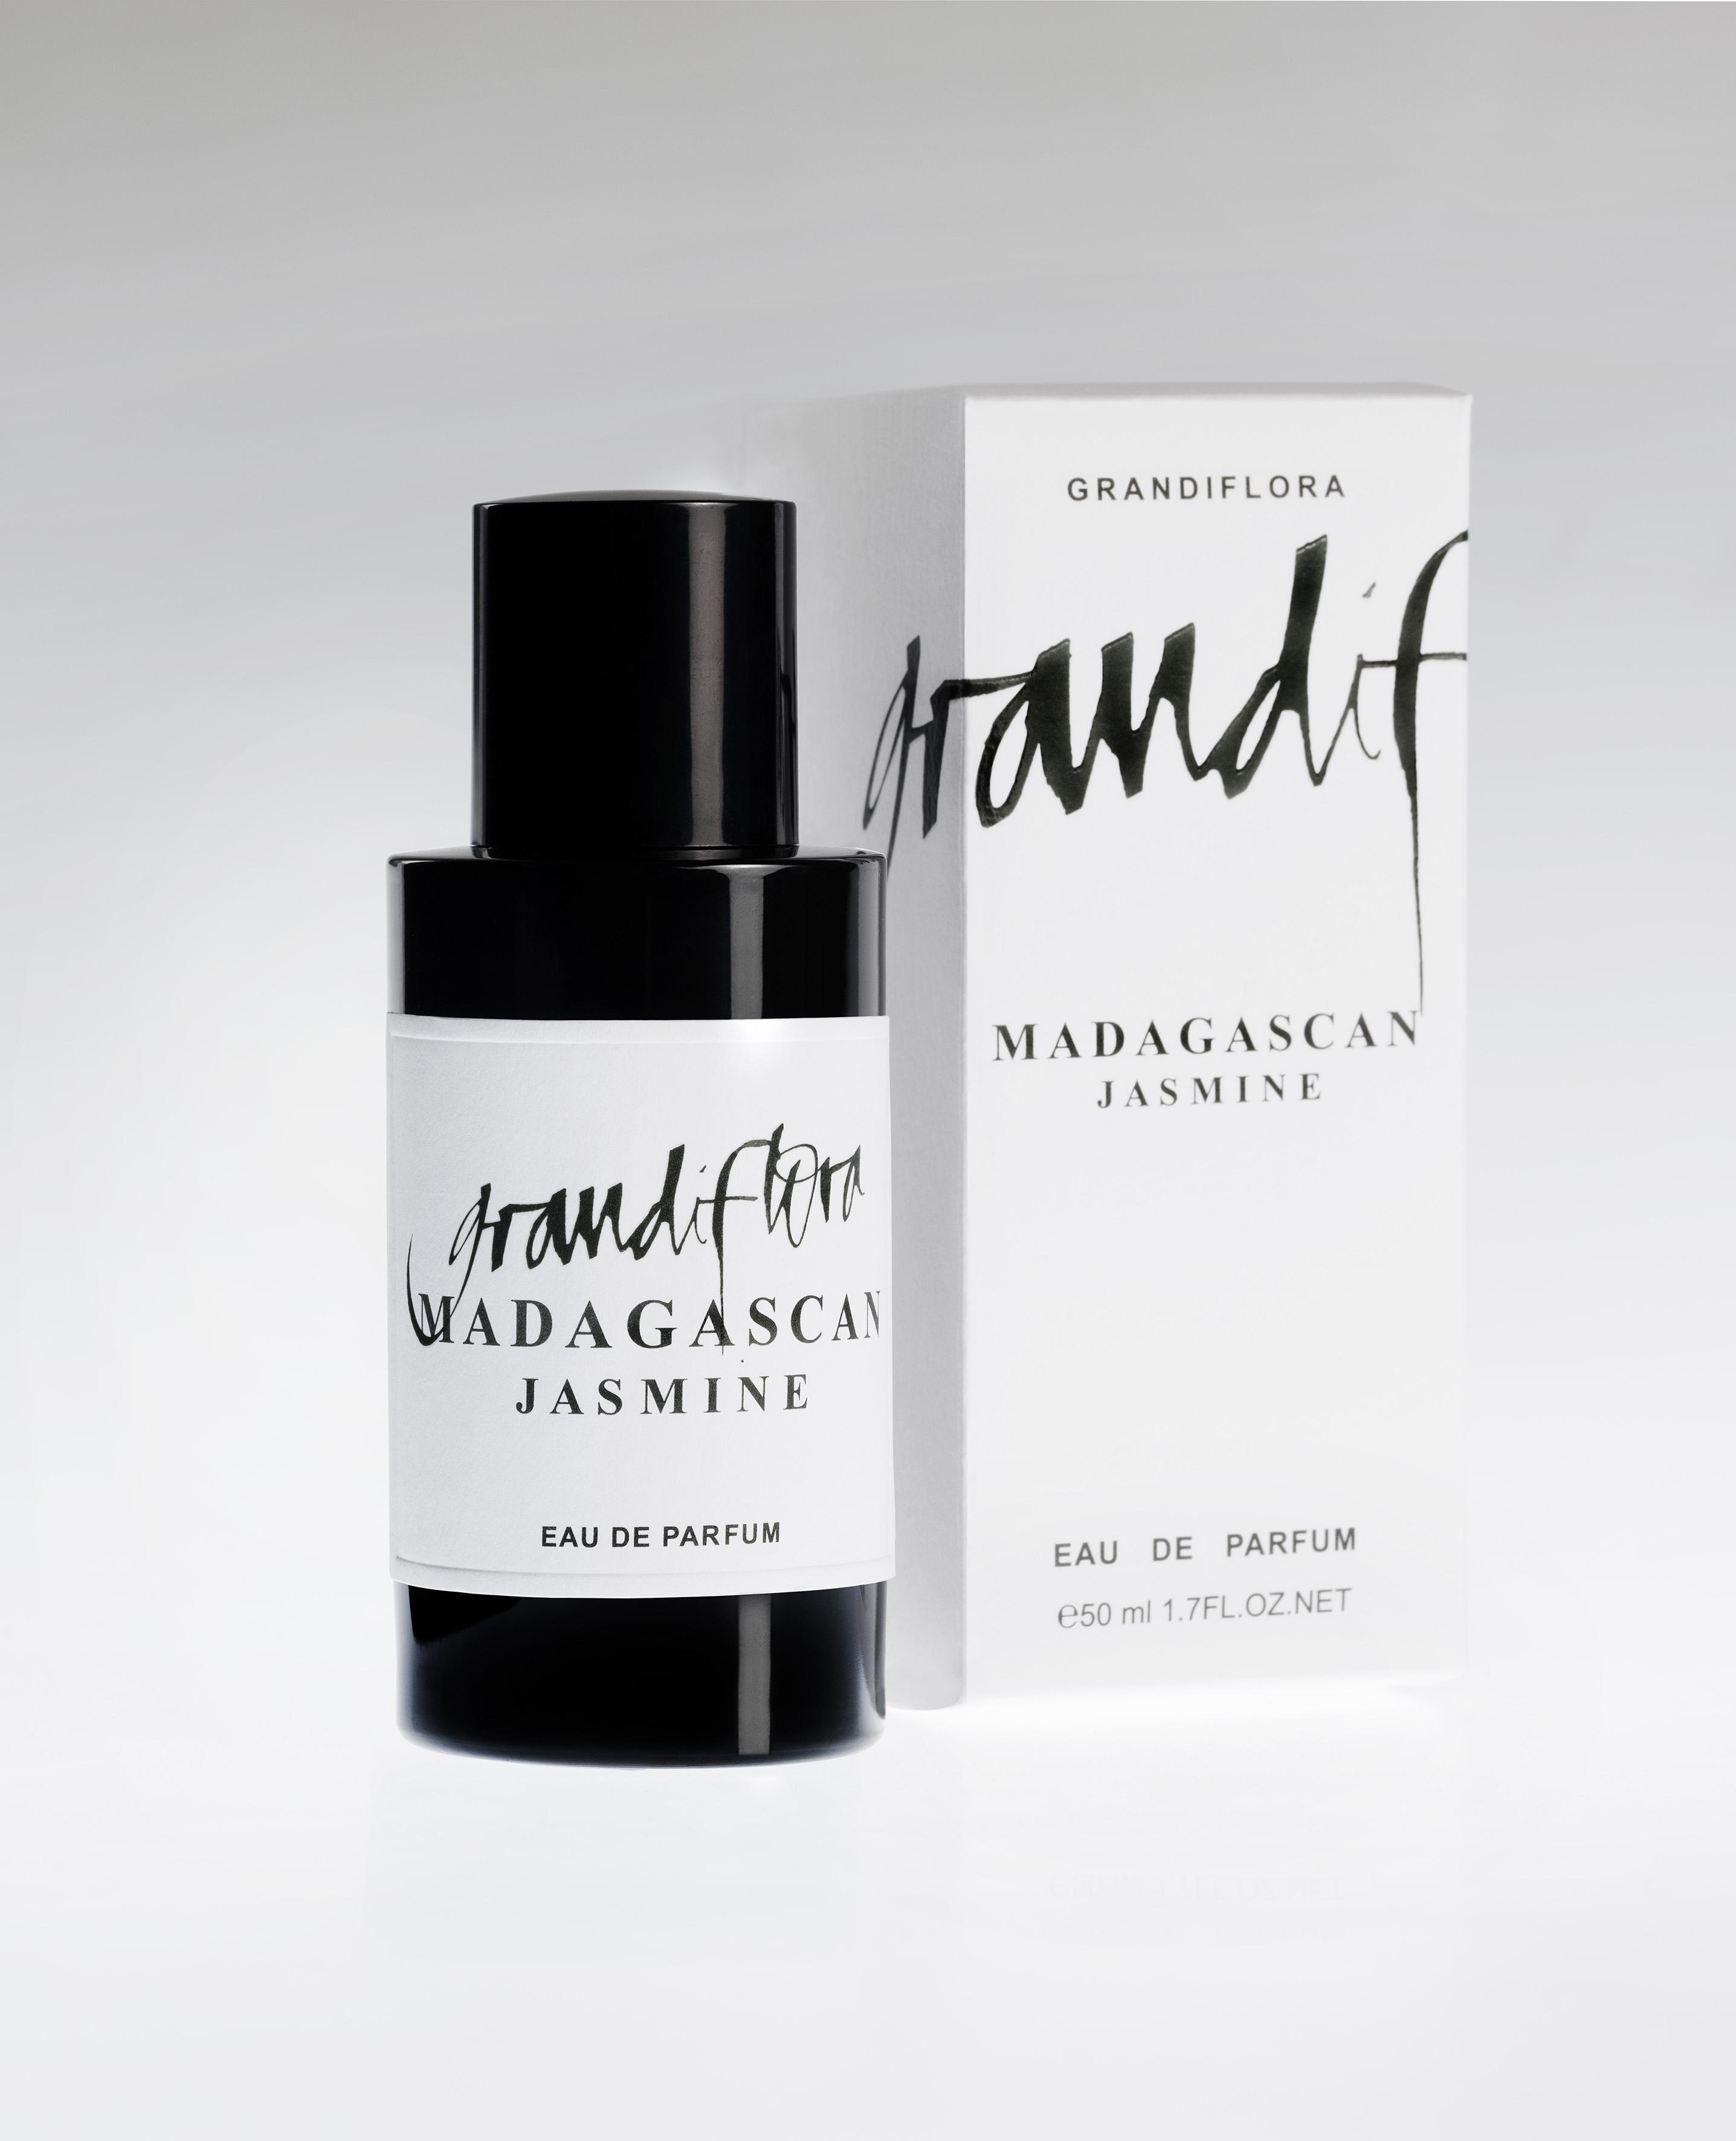 Madagascan Jasmine Grandiflora Perfume A Fragrance For Women And